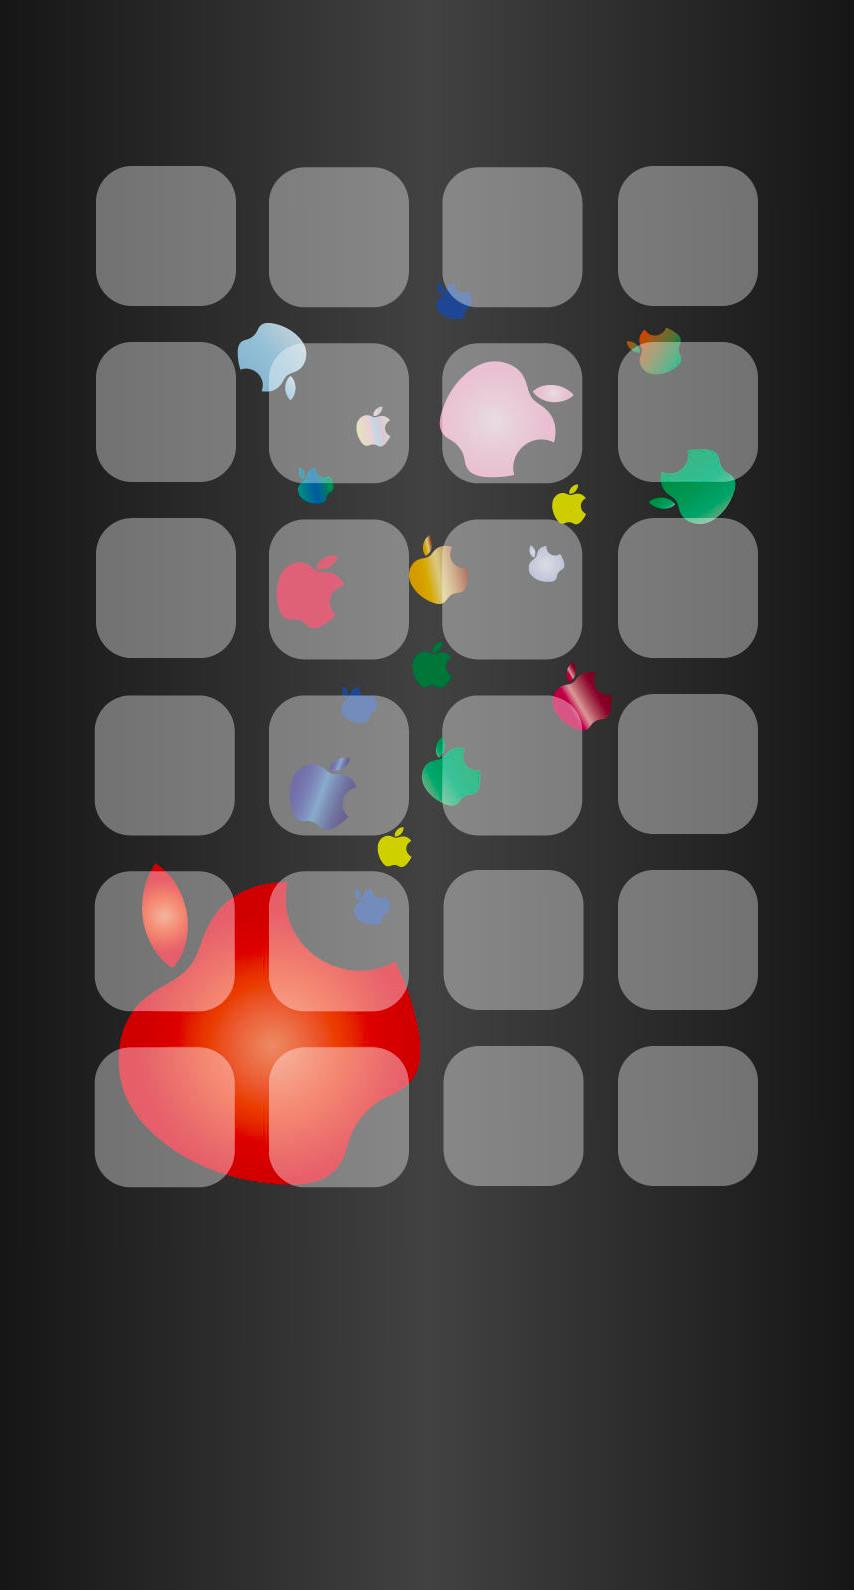 Wallpaper iphone hitam - Rak Logo Apple Hitam Iphone7 Wallpaper